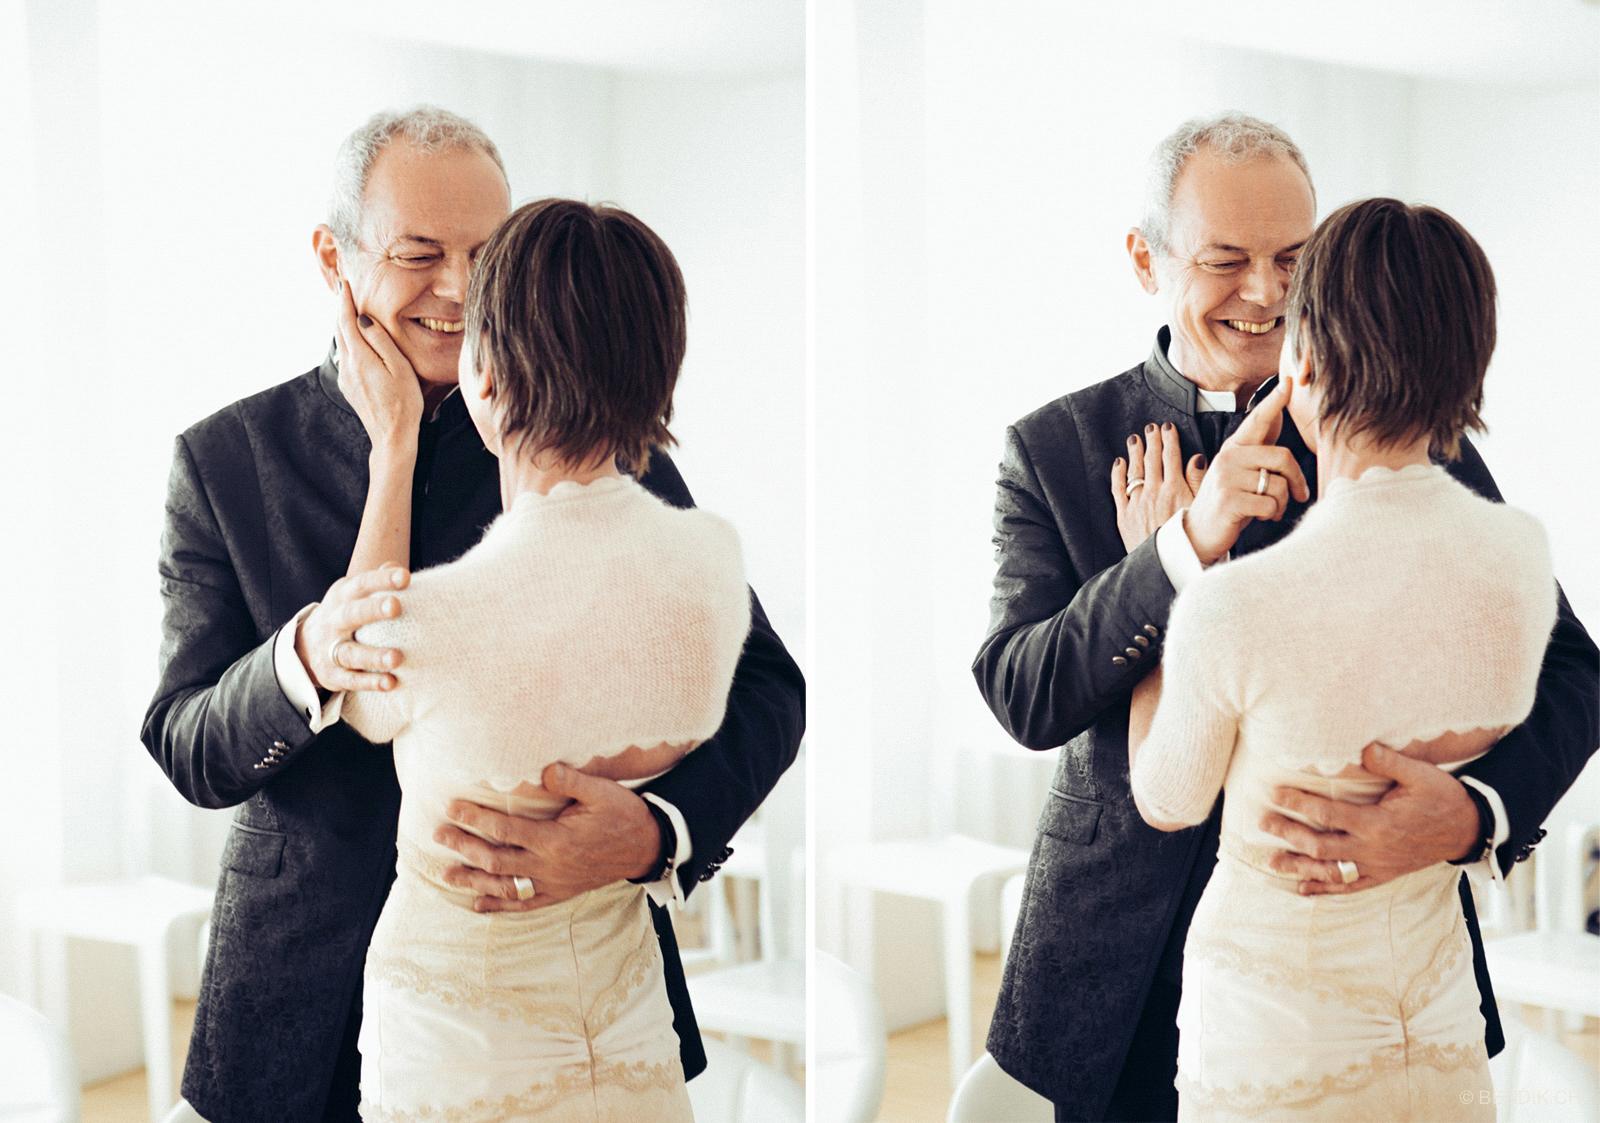 Brautpaar schaut sich lachend in Umarmung an